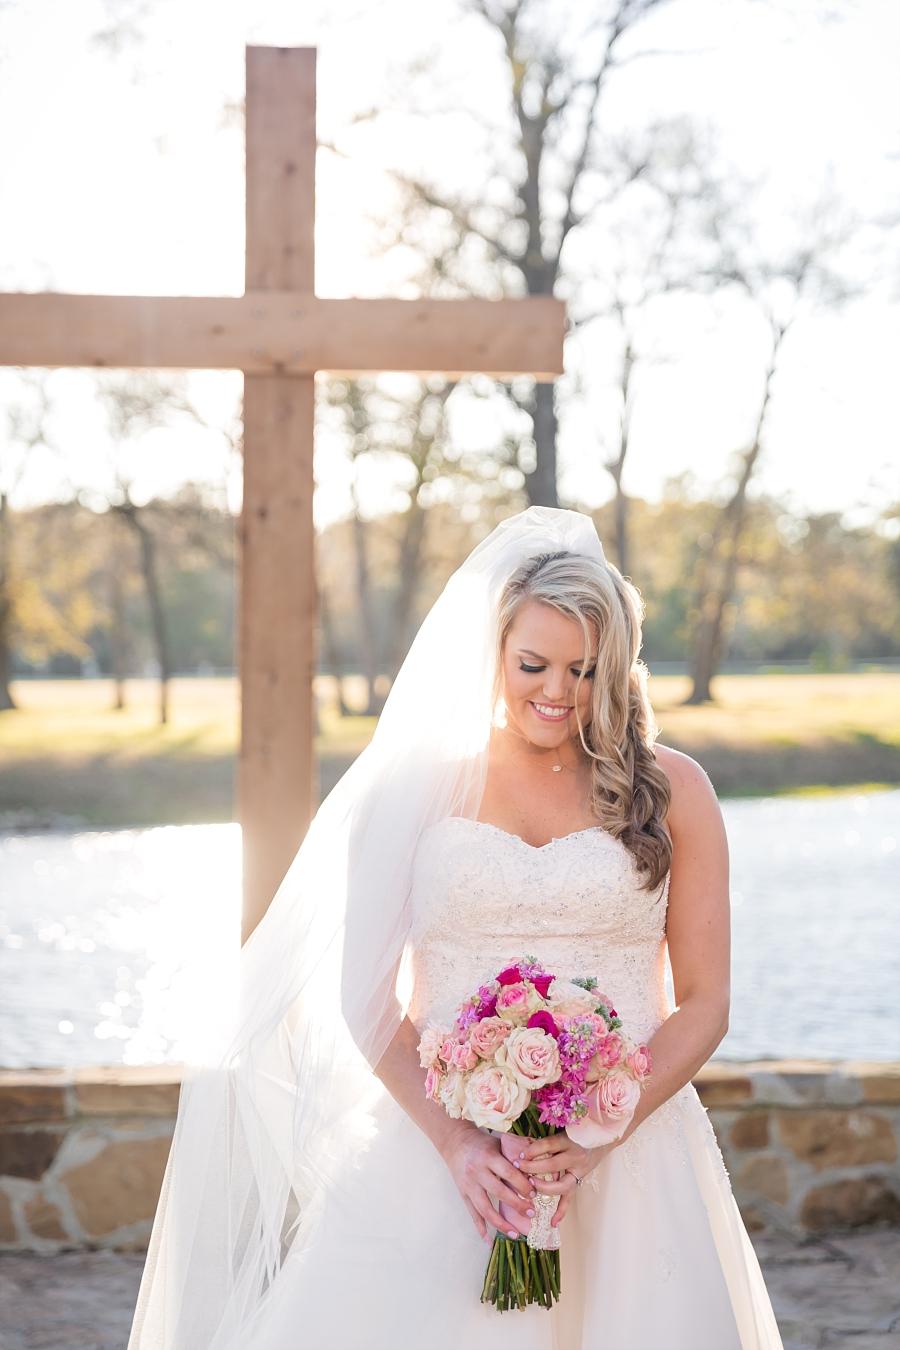 Stacy-Anderson-Photography-Balmorhea-Tomball-Wedding-Photographer_0015.jpg